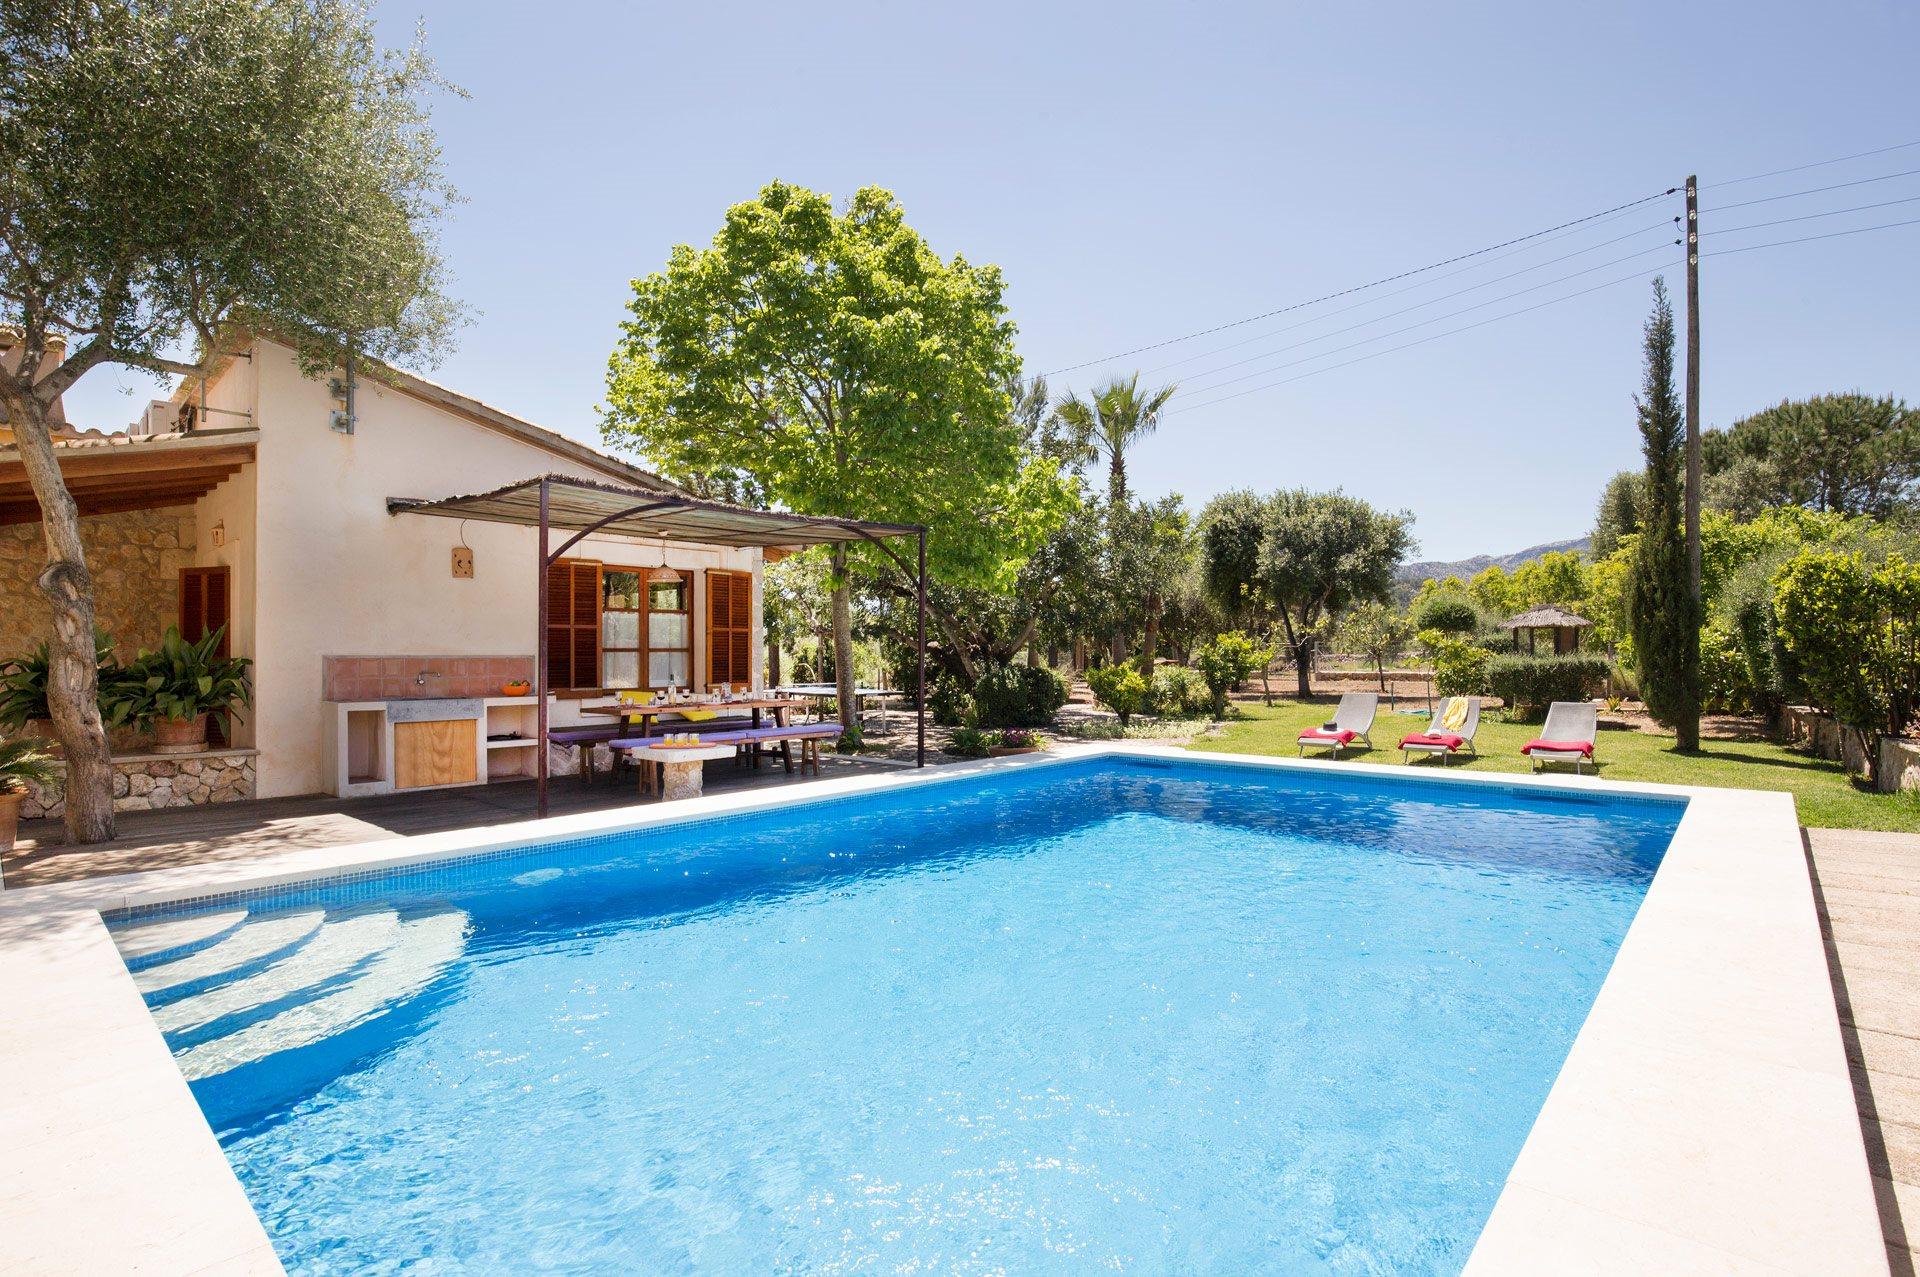 Villa Catalina, Pollensa, Majorca, Spain